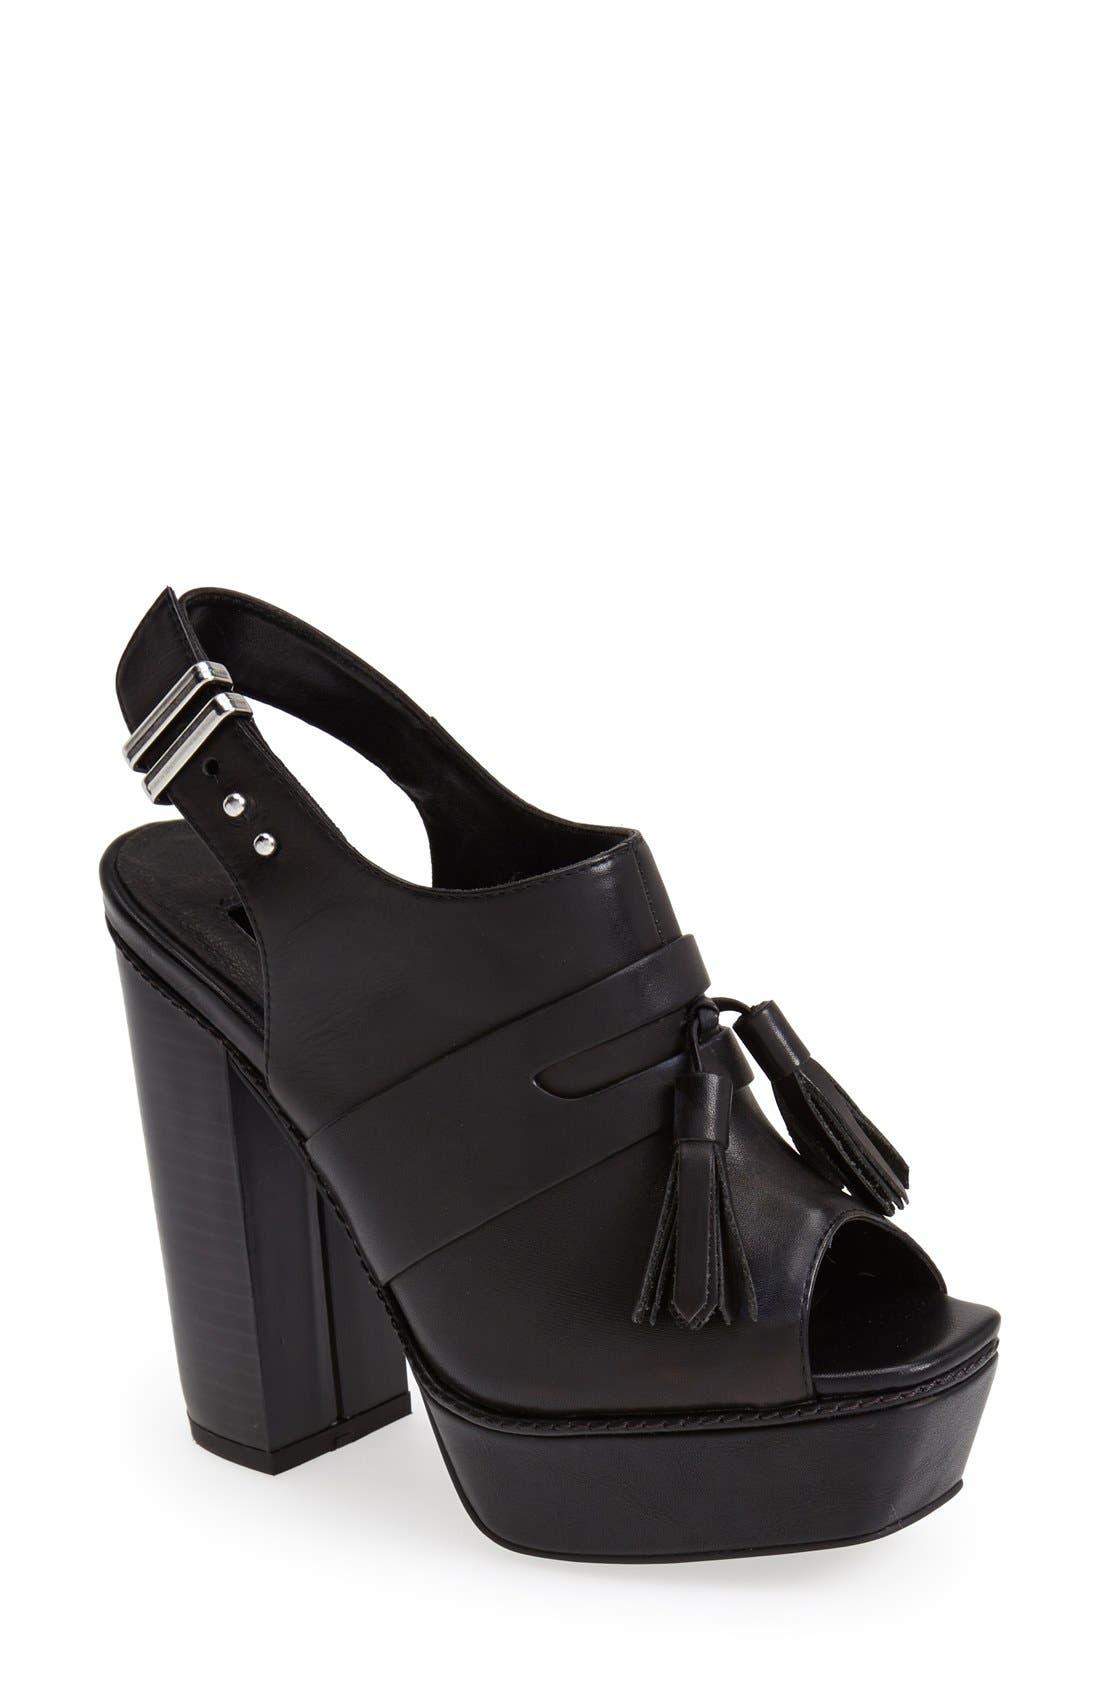 Main Image - Topshop 'Sassy' Platform Sandal